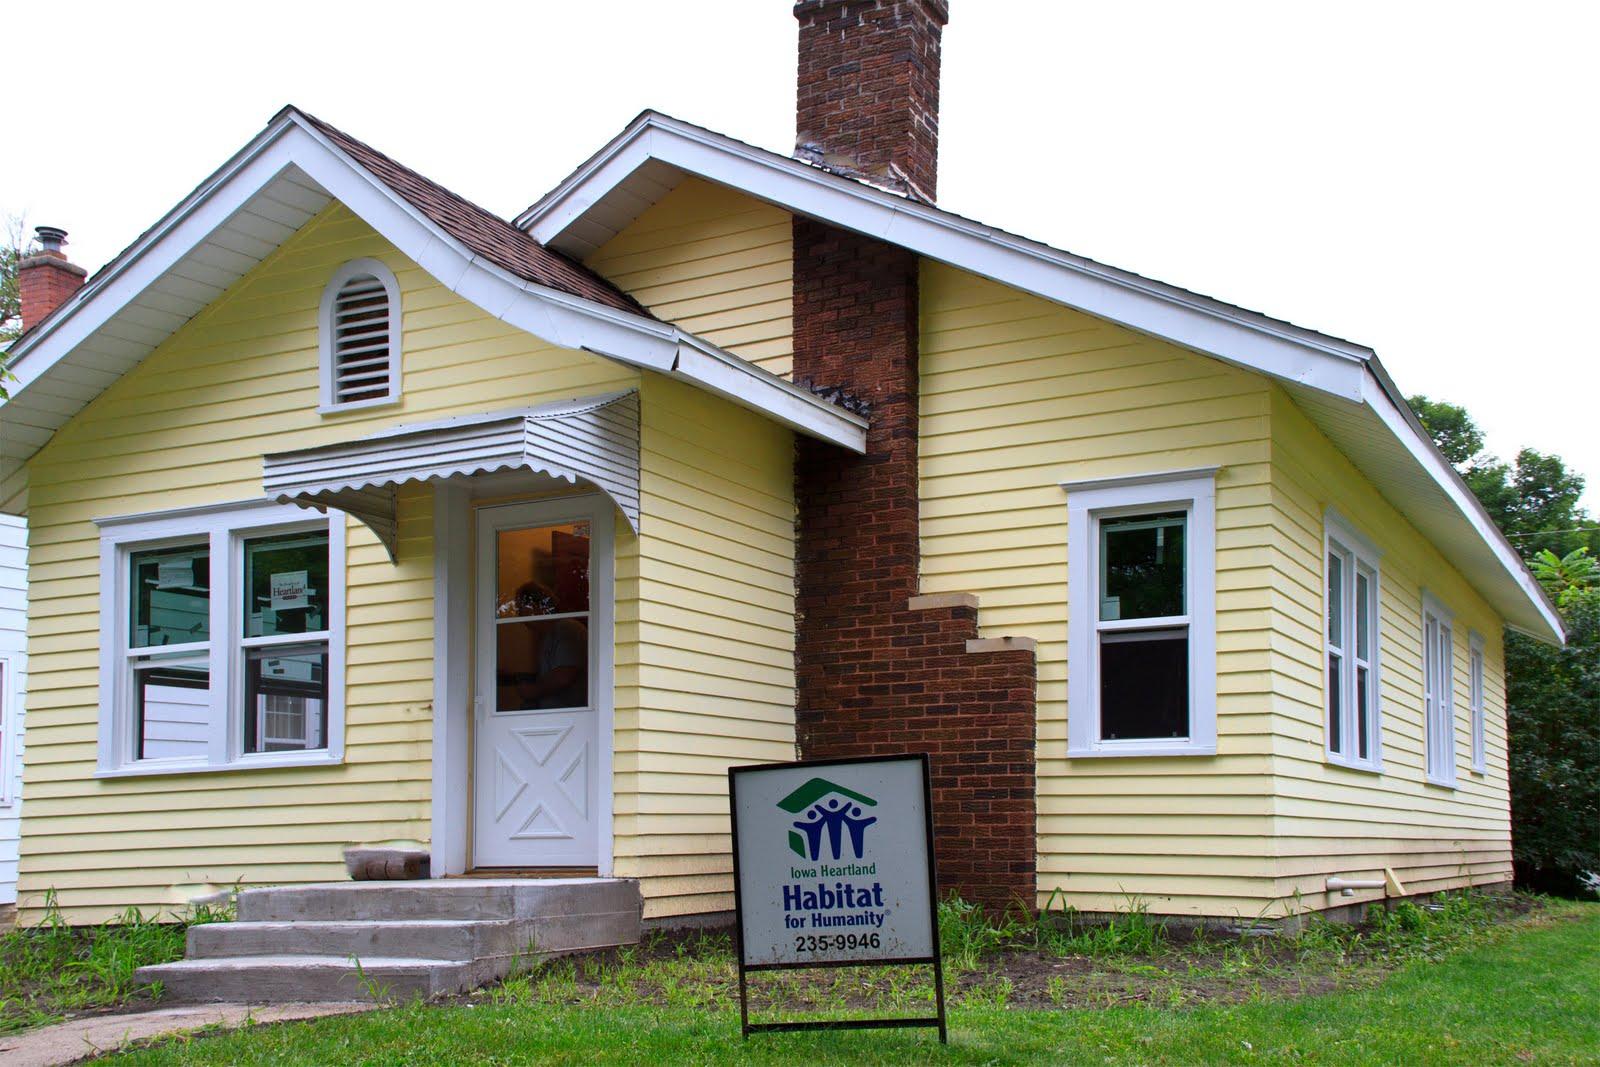 Iowa heartland habitat 400 000 homes built or repaired since 1976 - House habitat ...